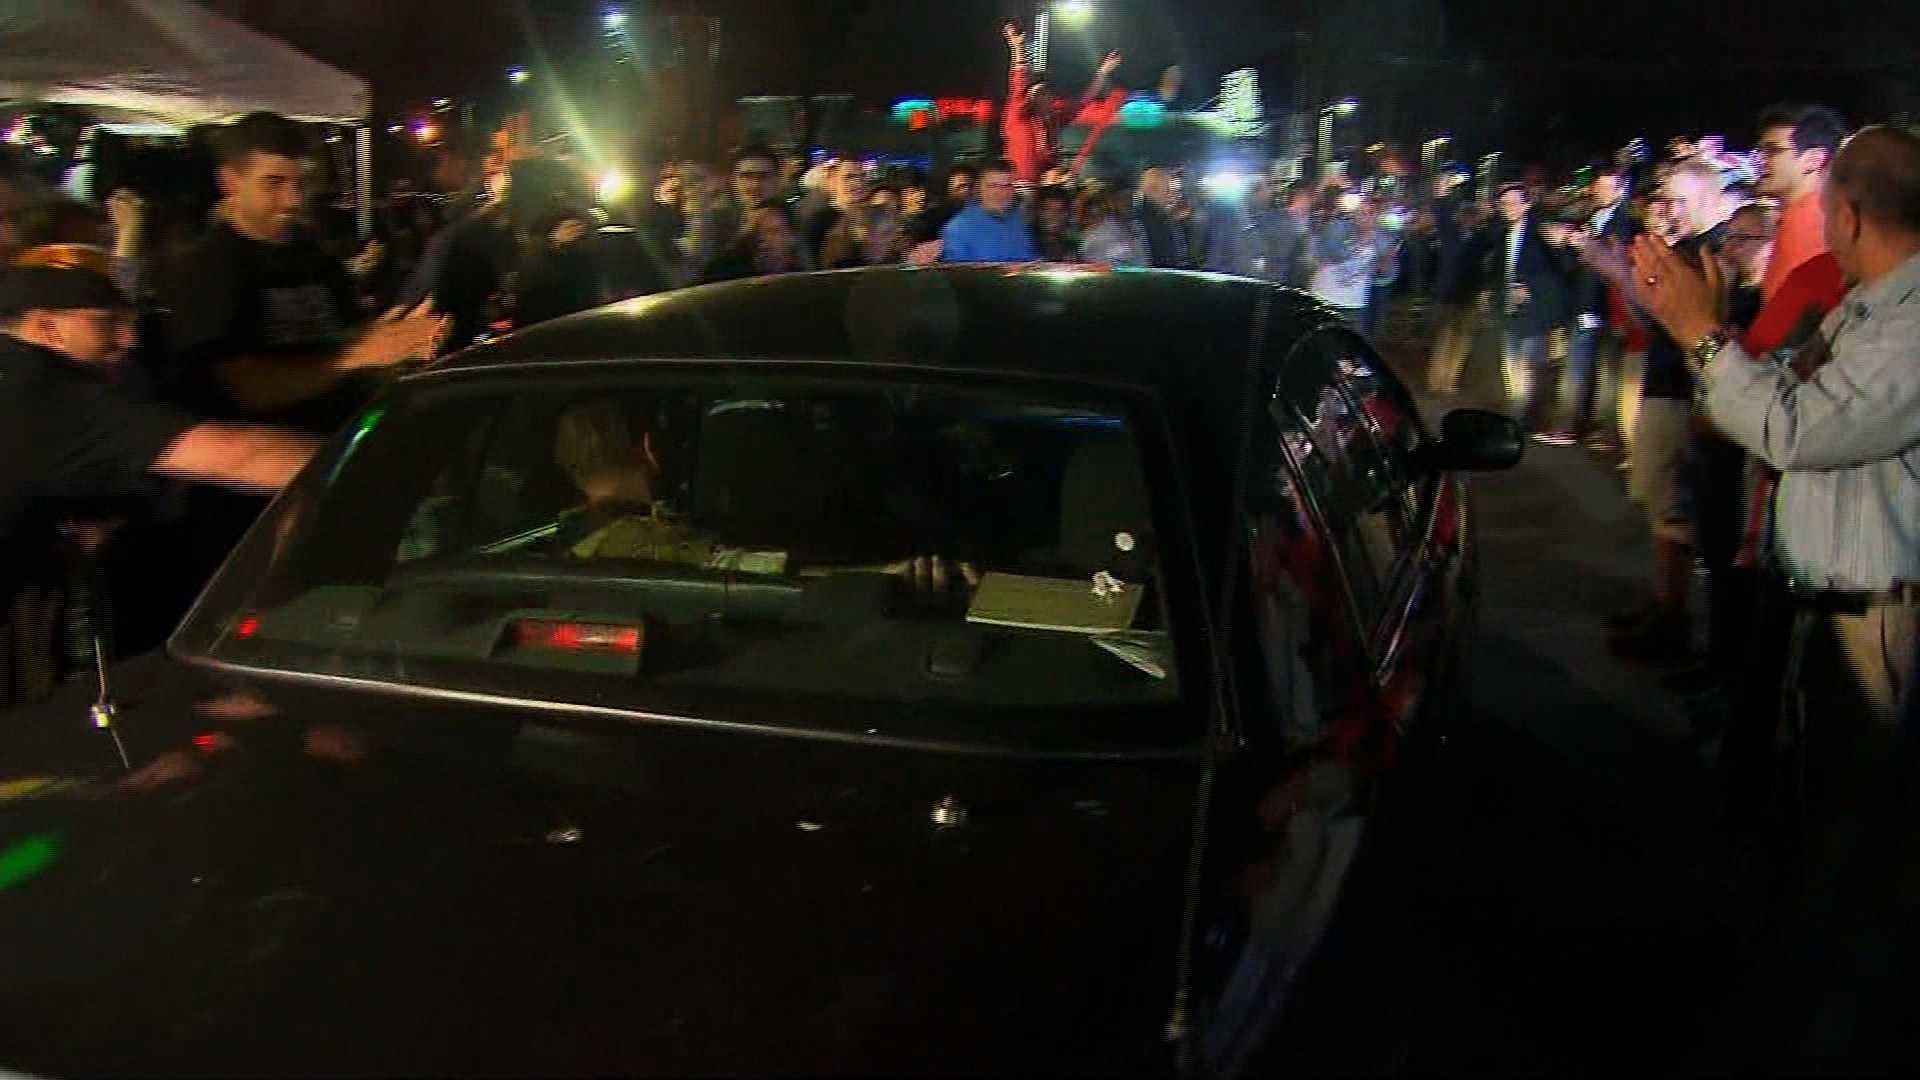 Boston celebrates after bombing suspect captured 3